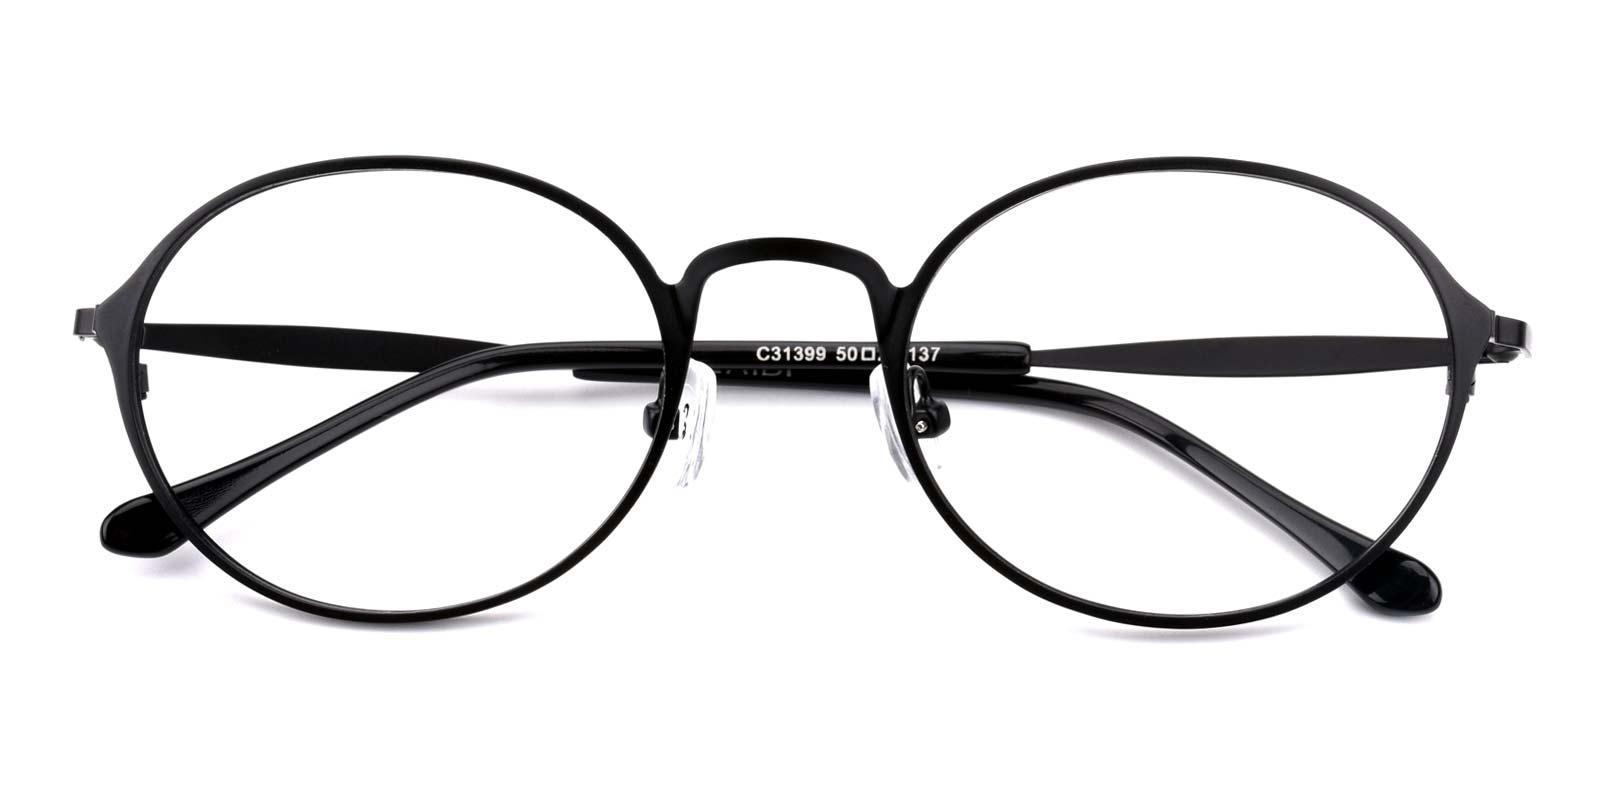 Gulio-Black-Oval-Metal-Eyeglasses-detail